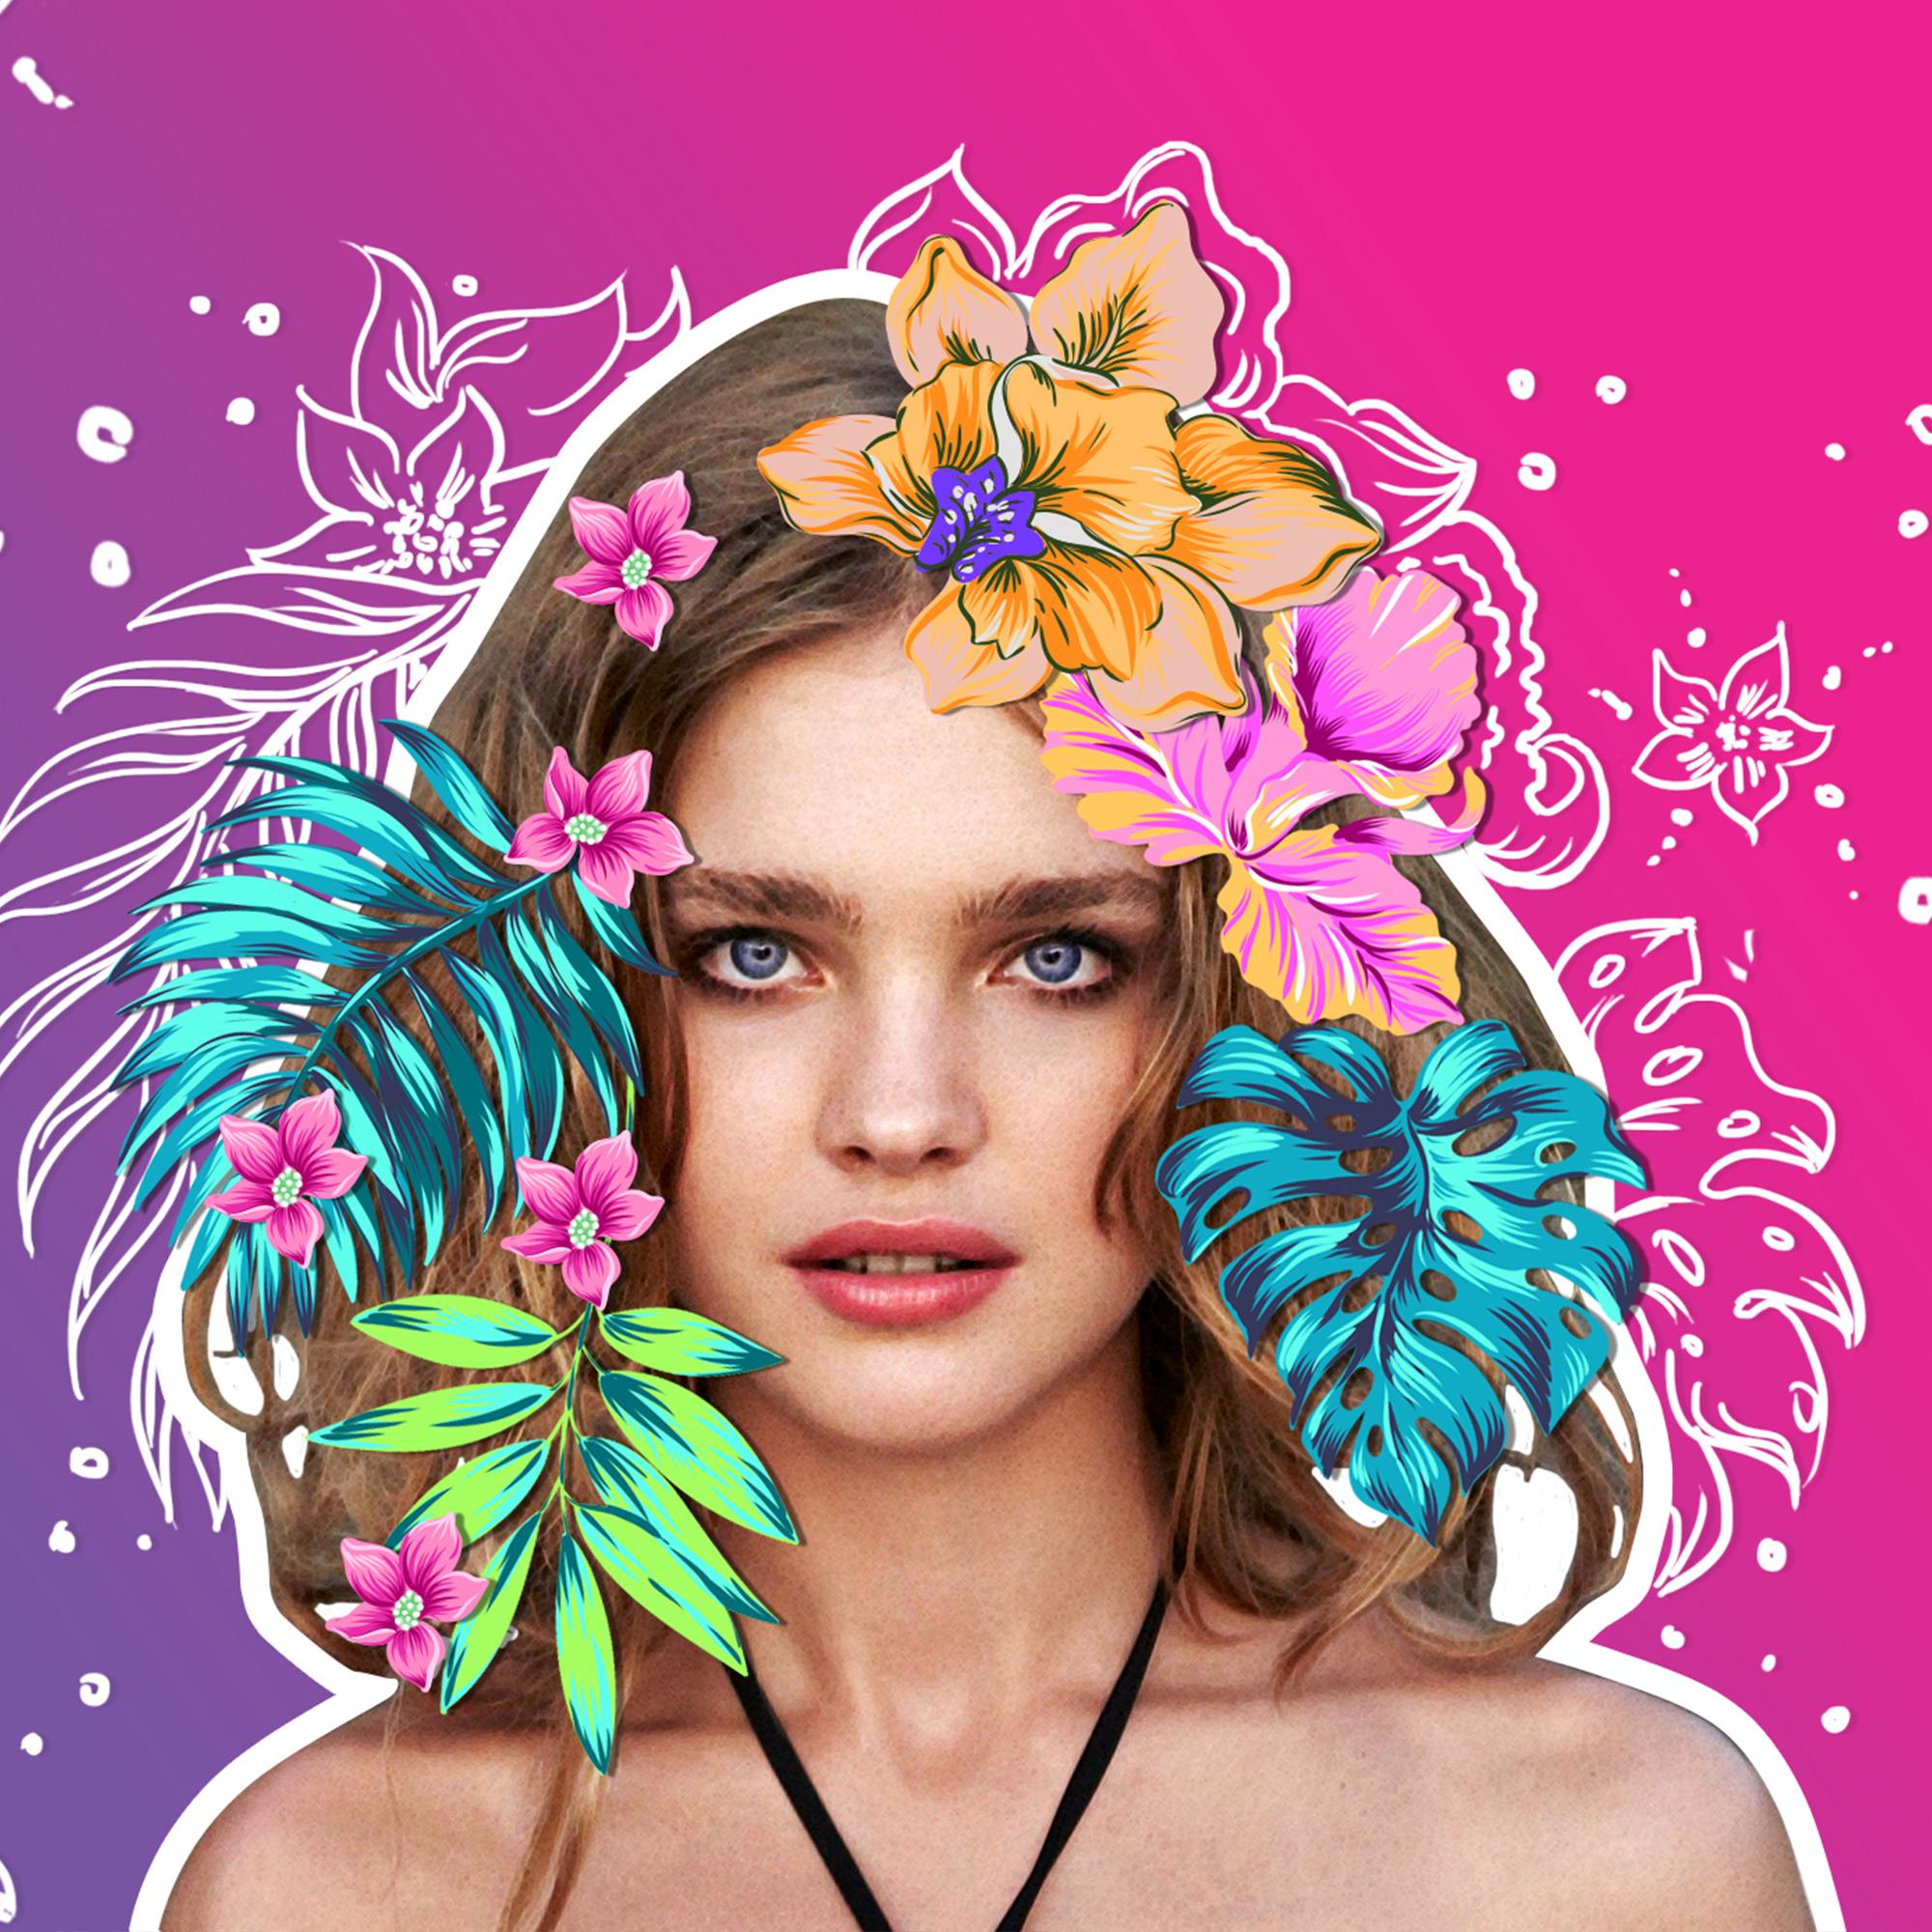 Natalia Vodianova Joins PicsArt as Head of Aspiration ...